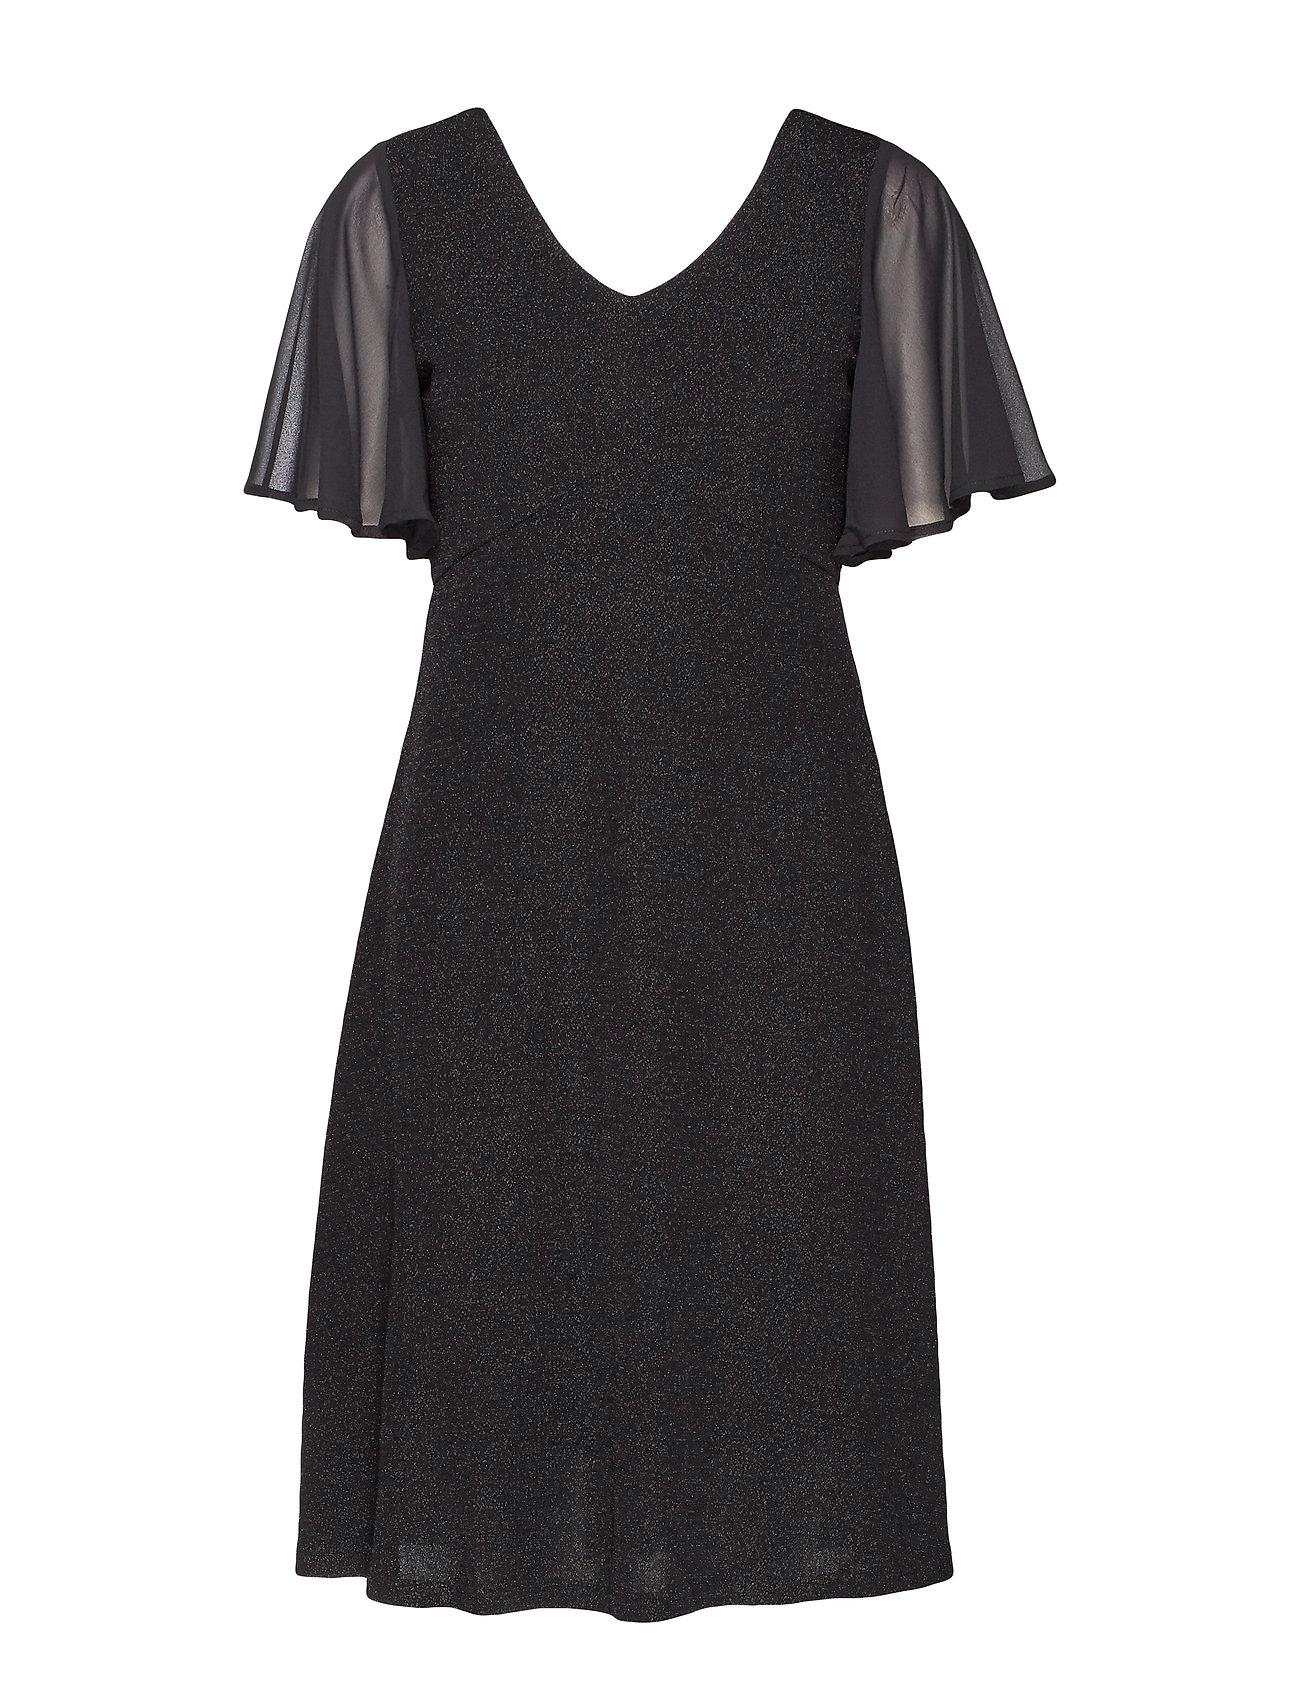 Cream MinuCR Short Dress - PITCH BLACK